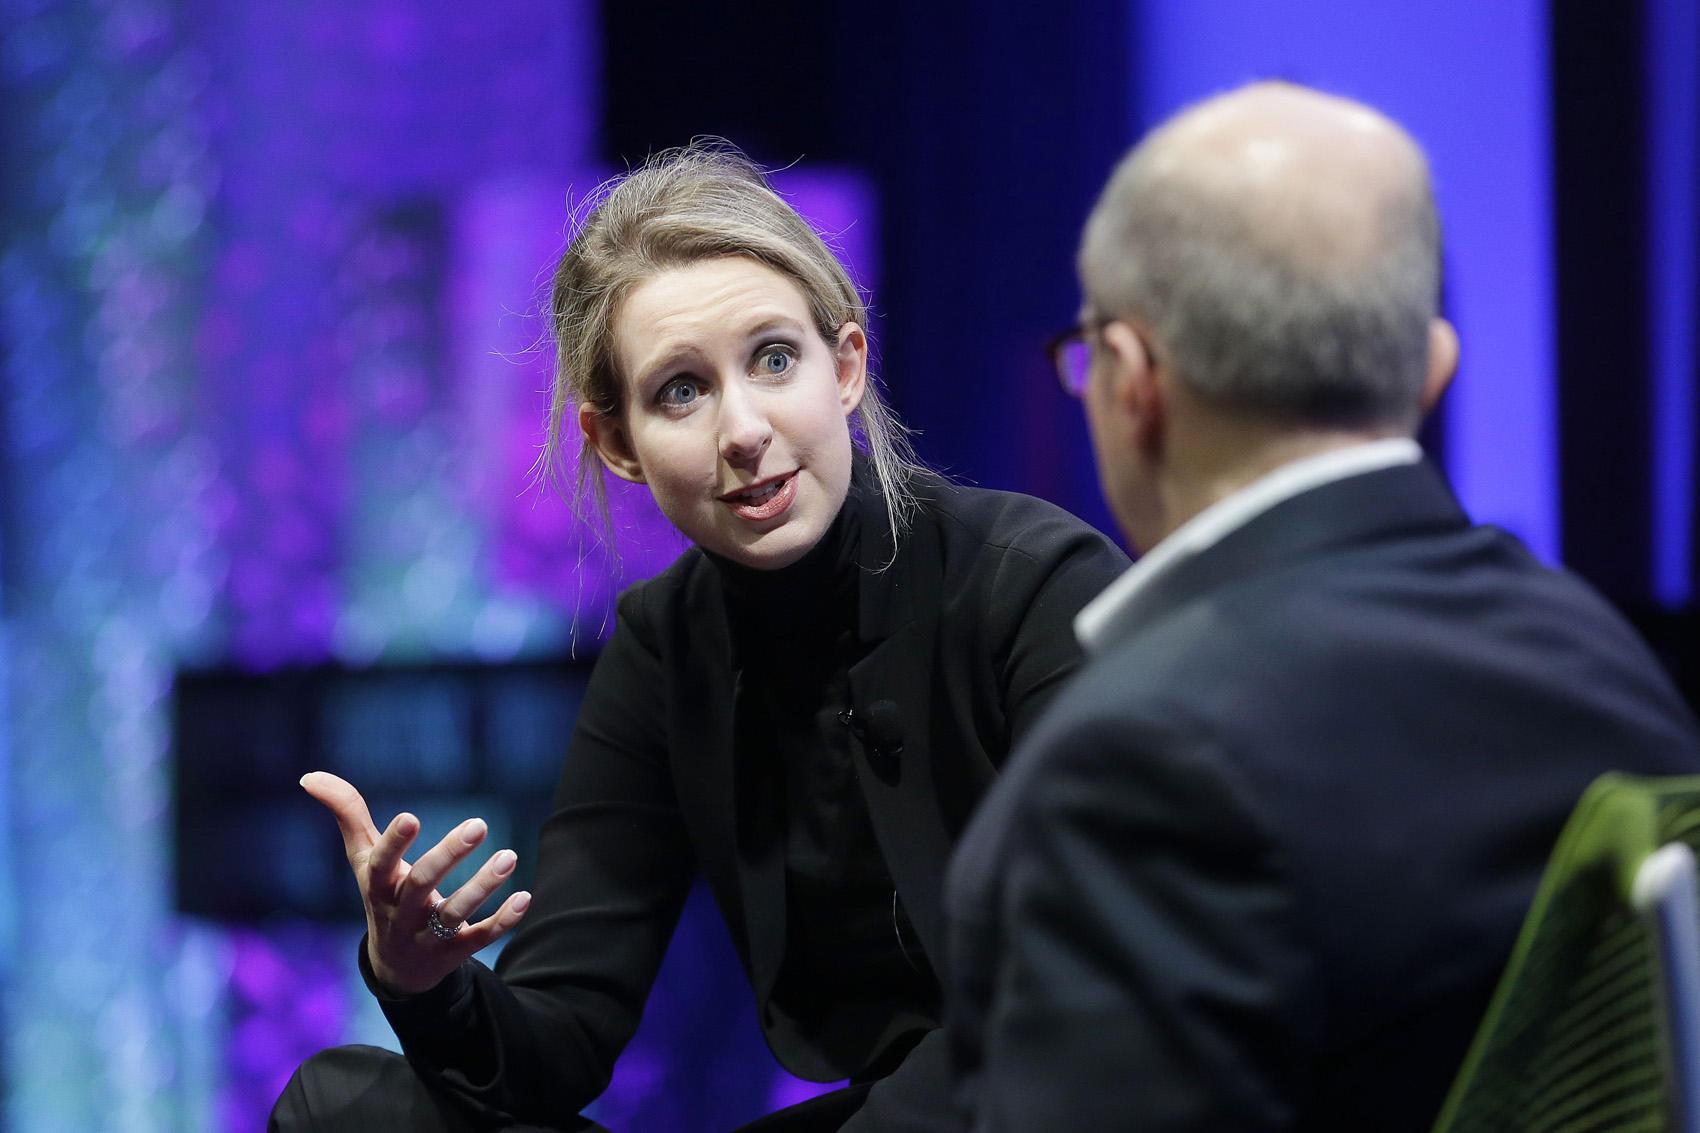 'The Inventor': Elizabeth Holmes' Theranos Scam That Rocked Silicon Valley